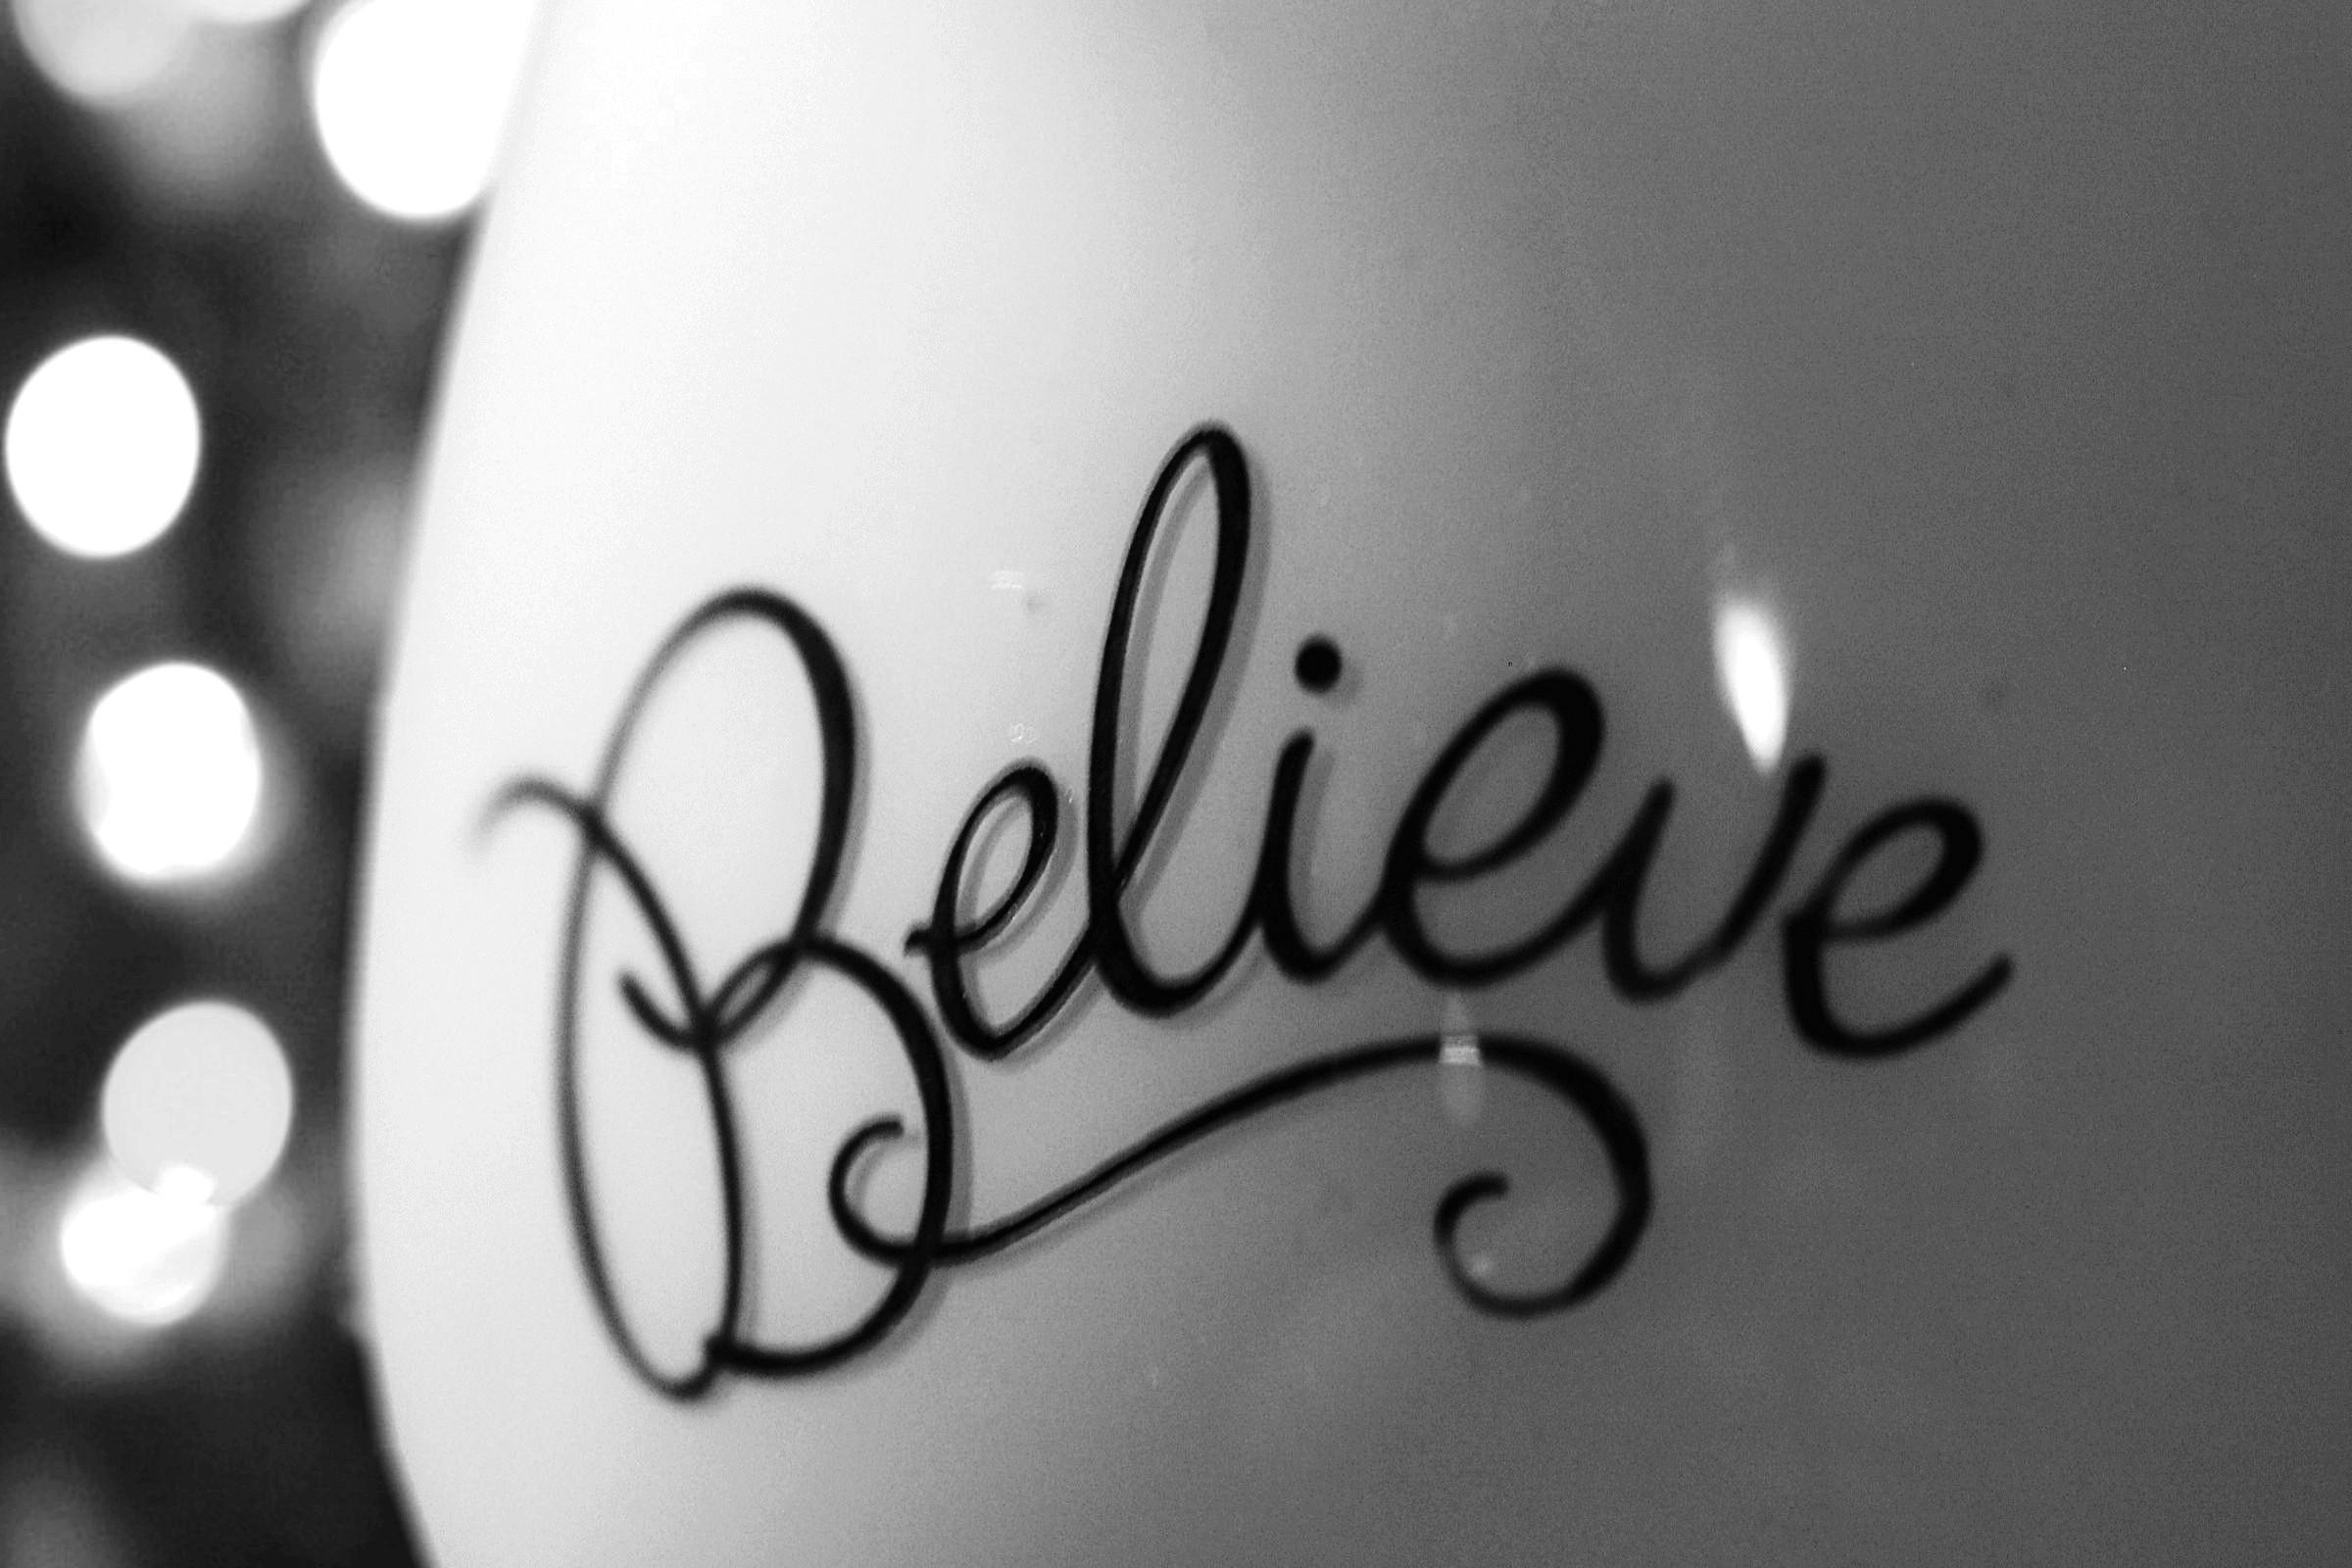 Believe-photography-9501412-2400-1600.jpg